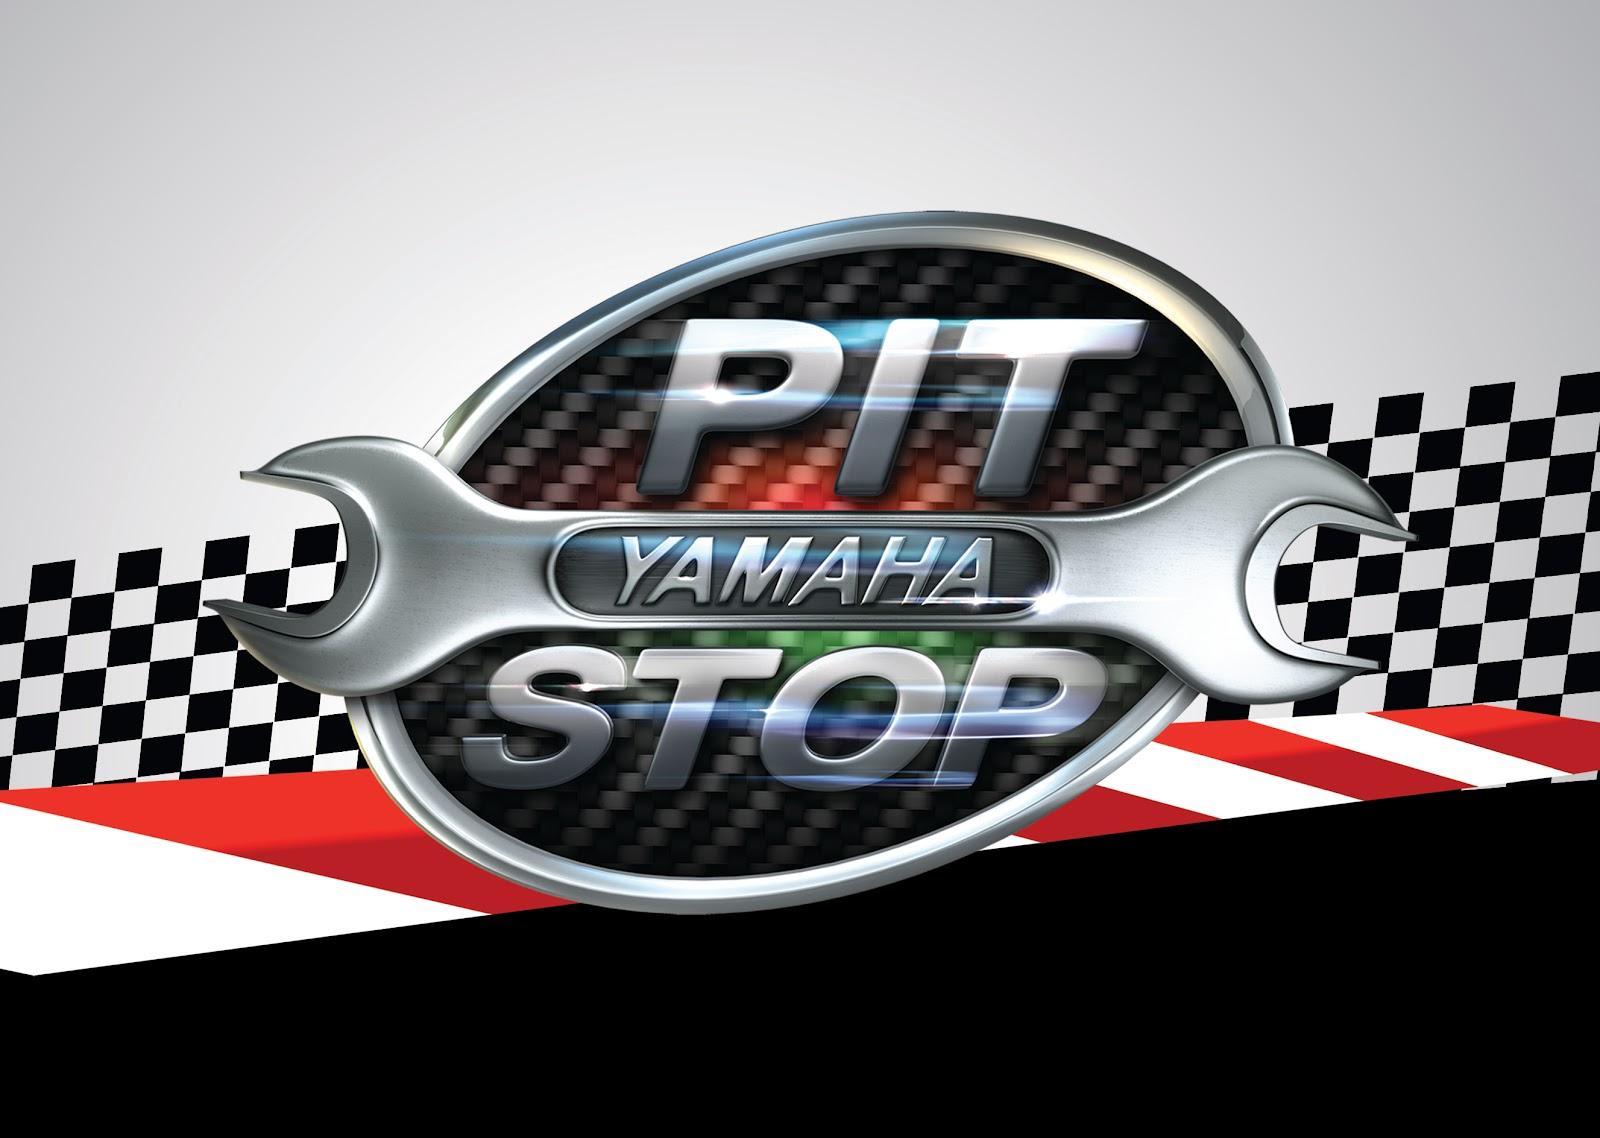 Carboni Motos Yamaha realiza Pit Stop neste sábado pitstop yamaha